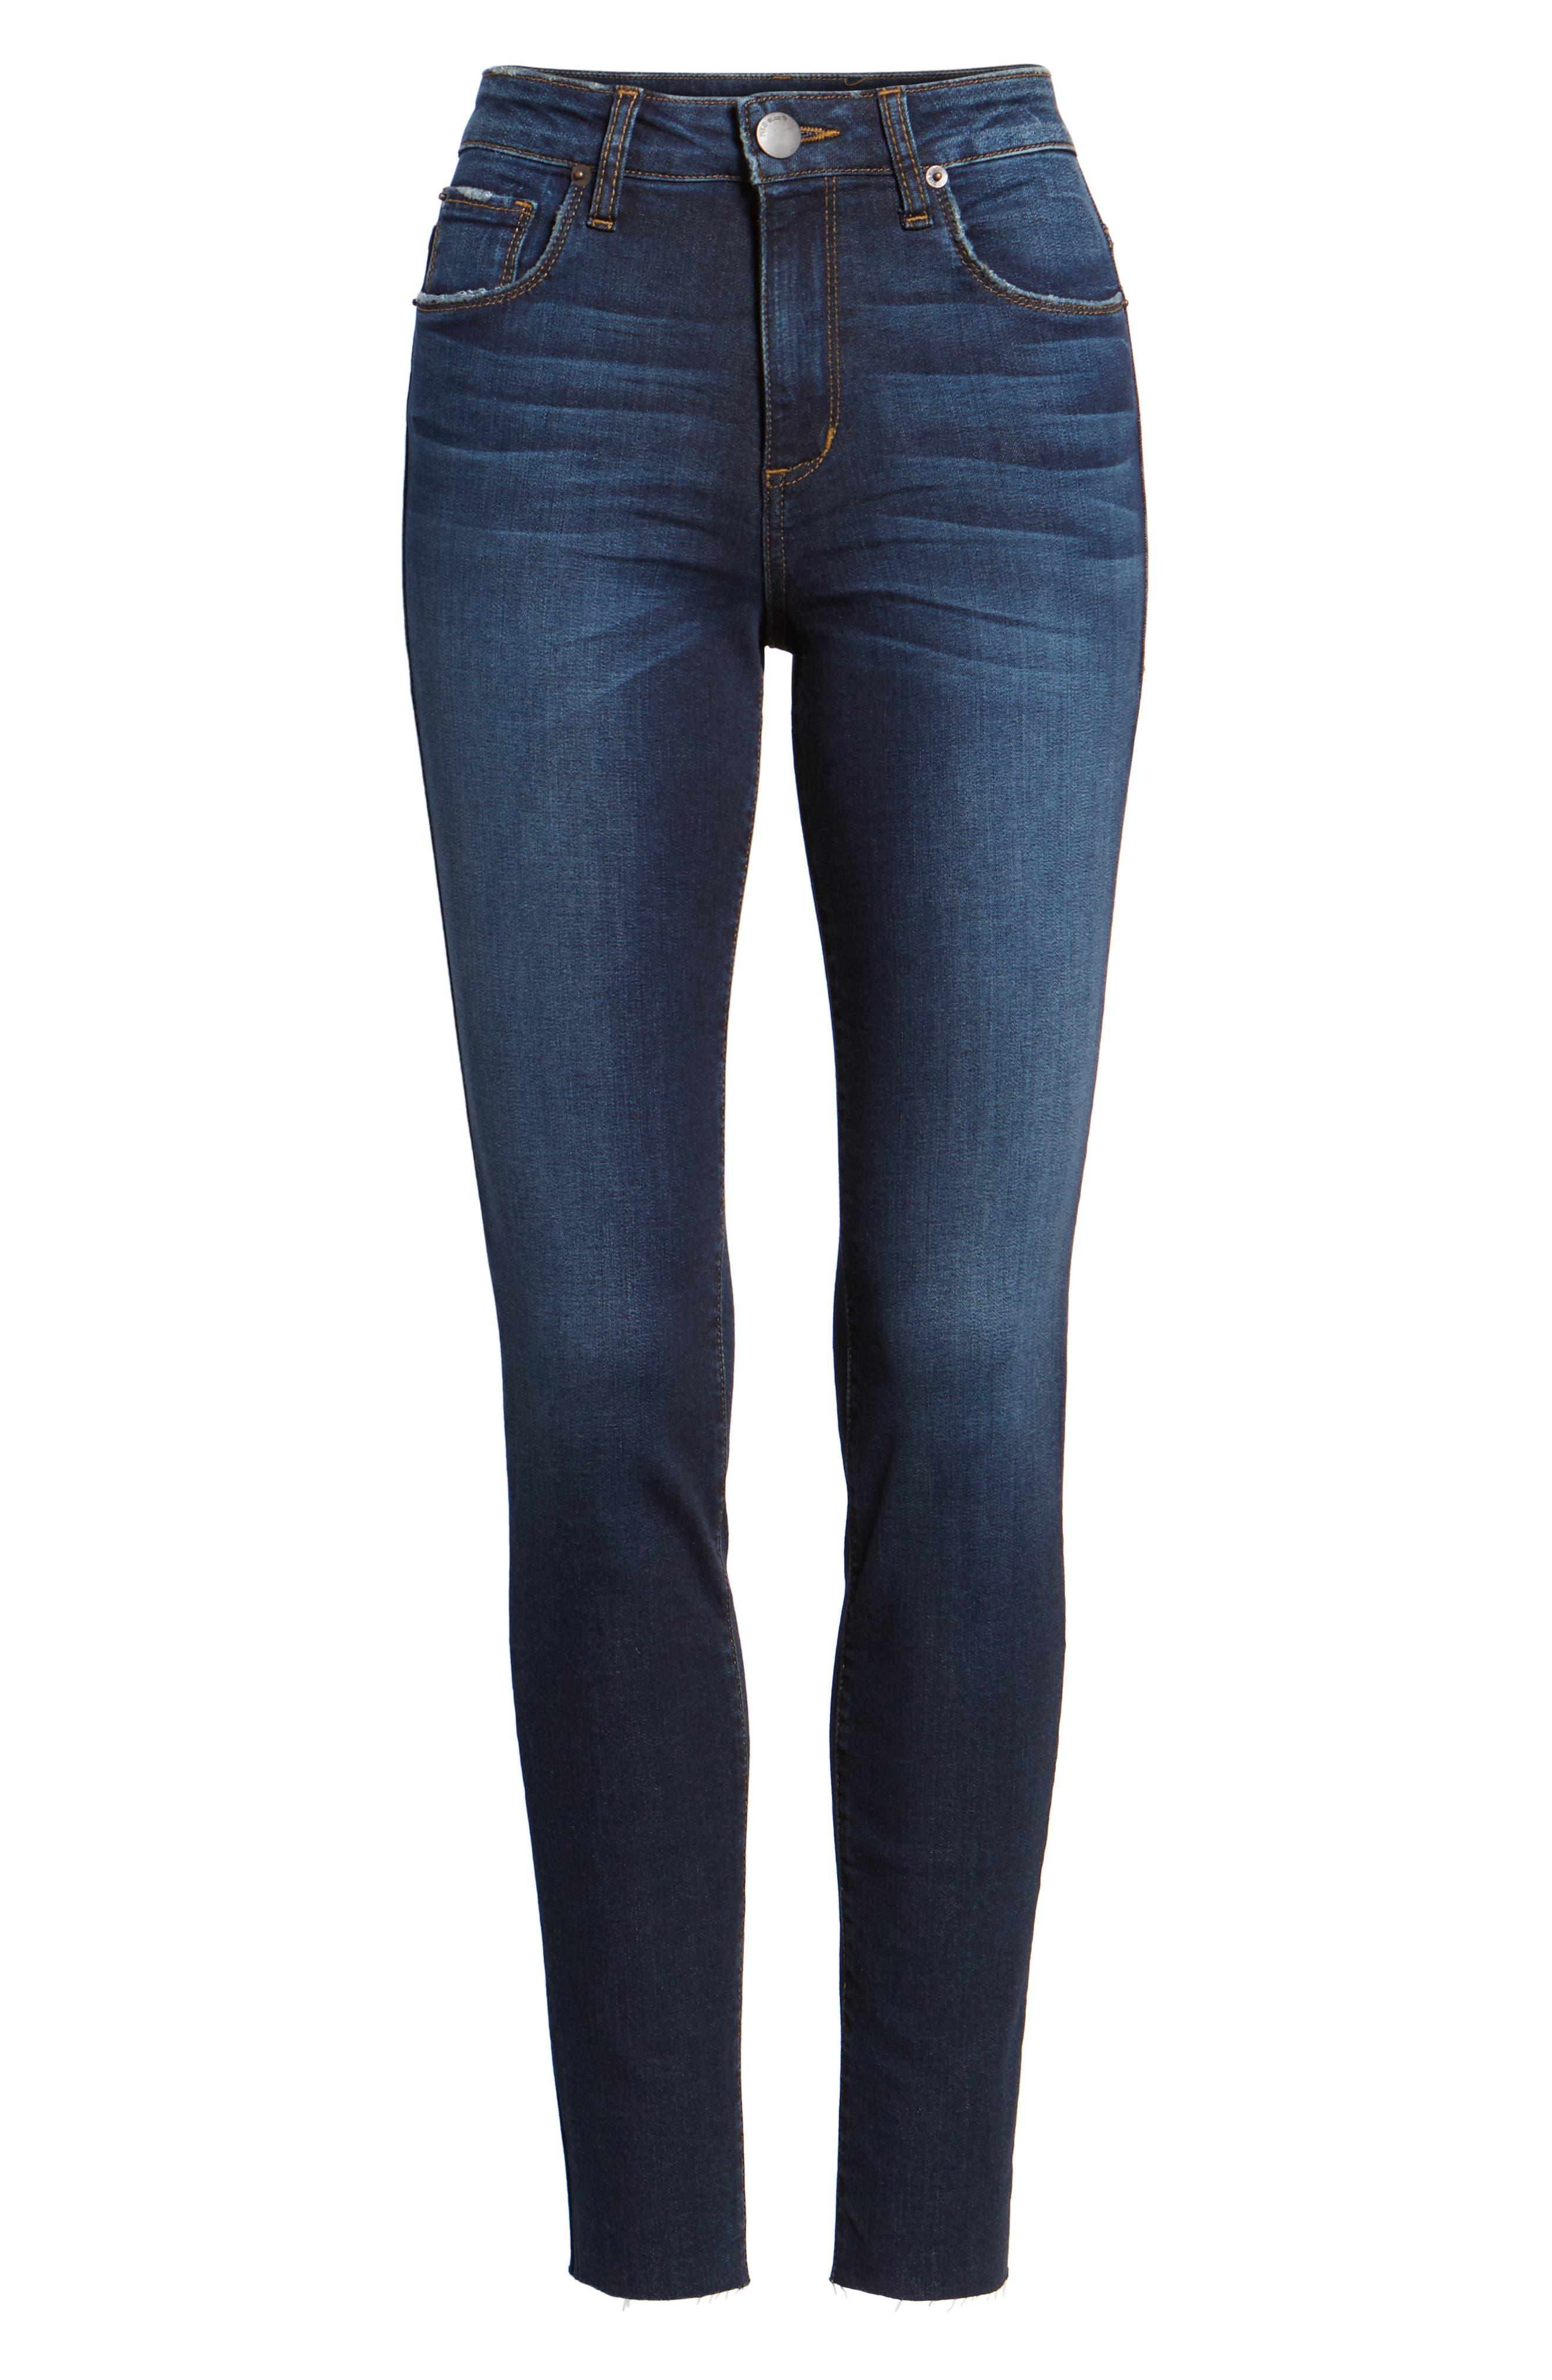 STS BLUE, Ellie High Waist Ankle Skinny Jeans, Alternate thumbnail 7, color, DENLEY